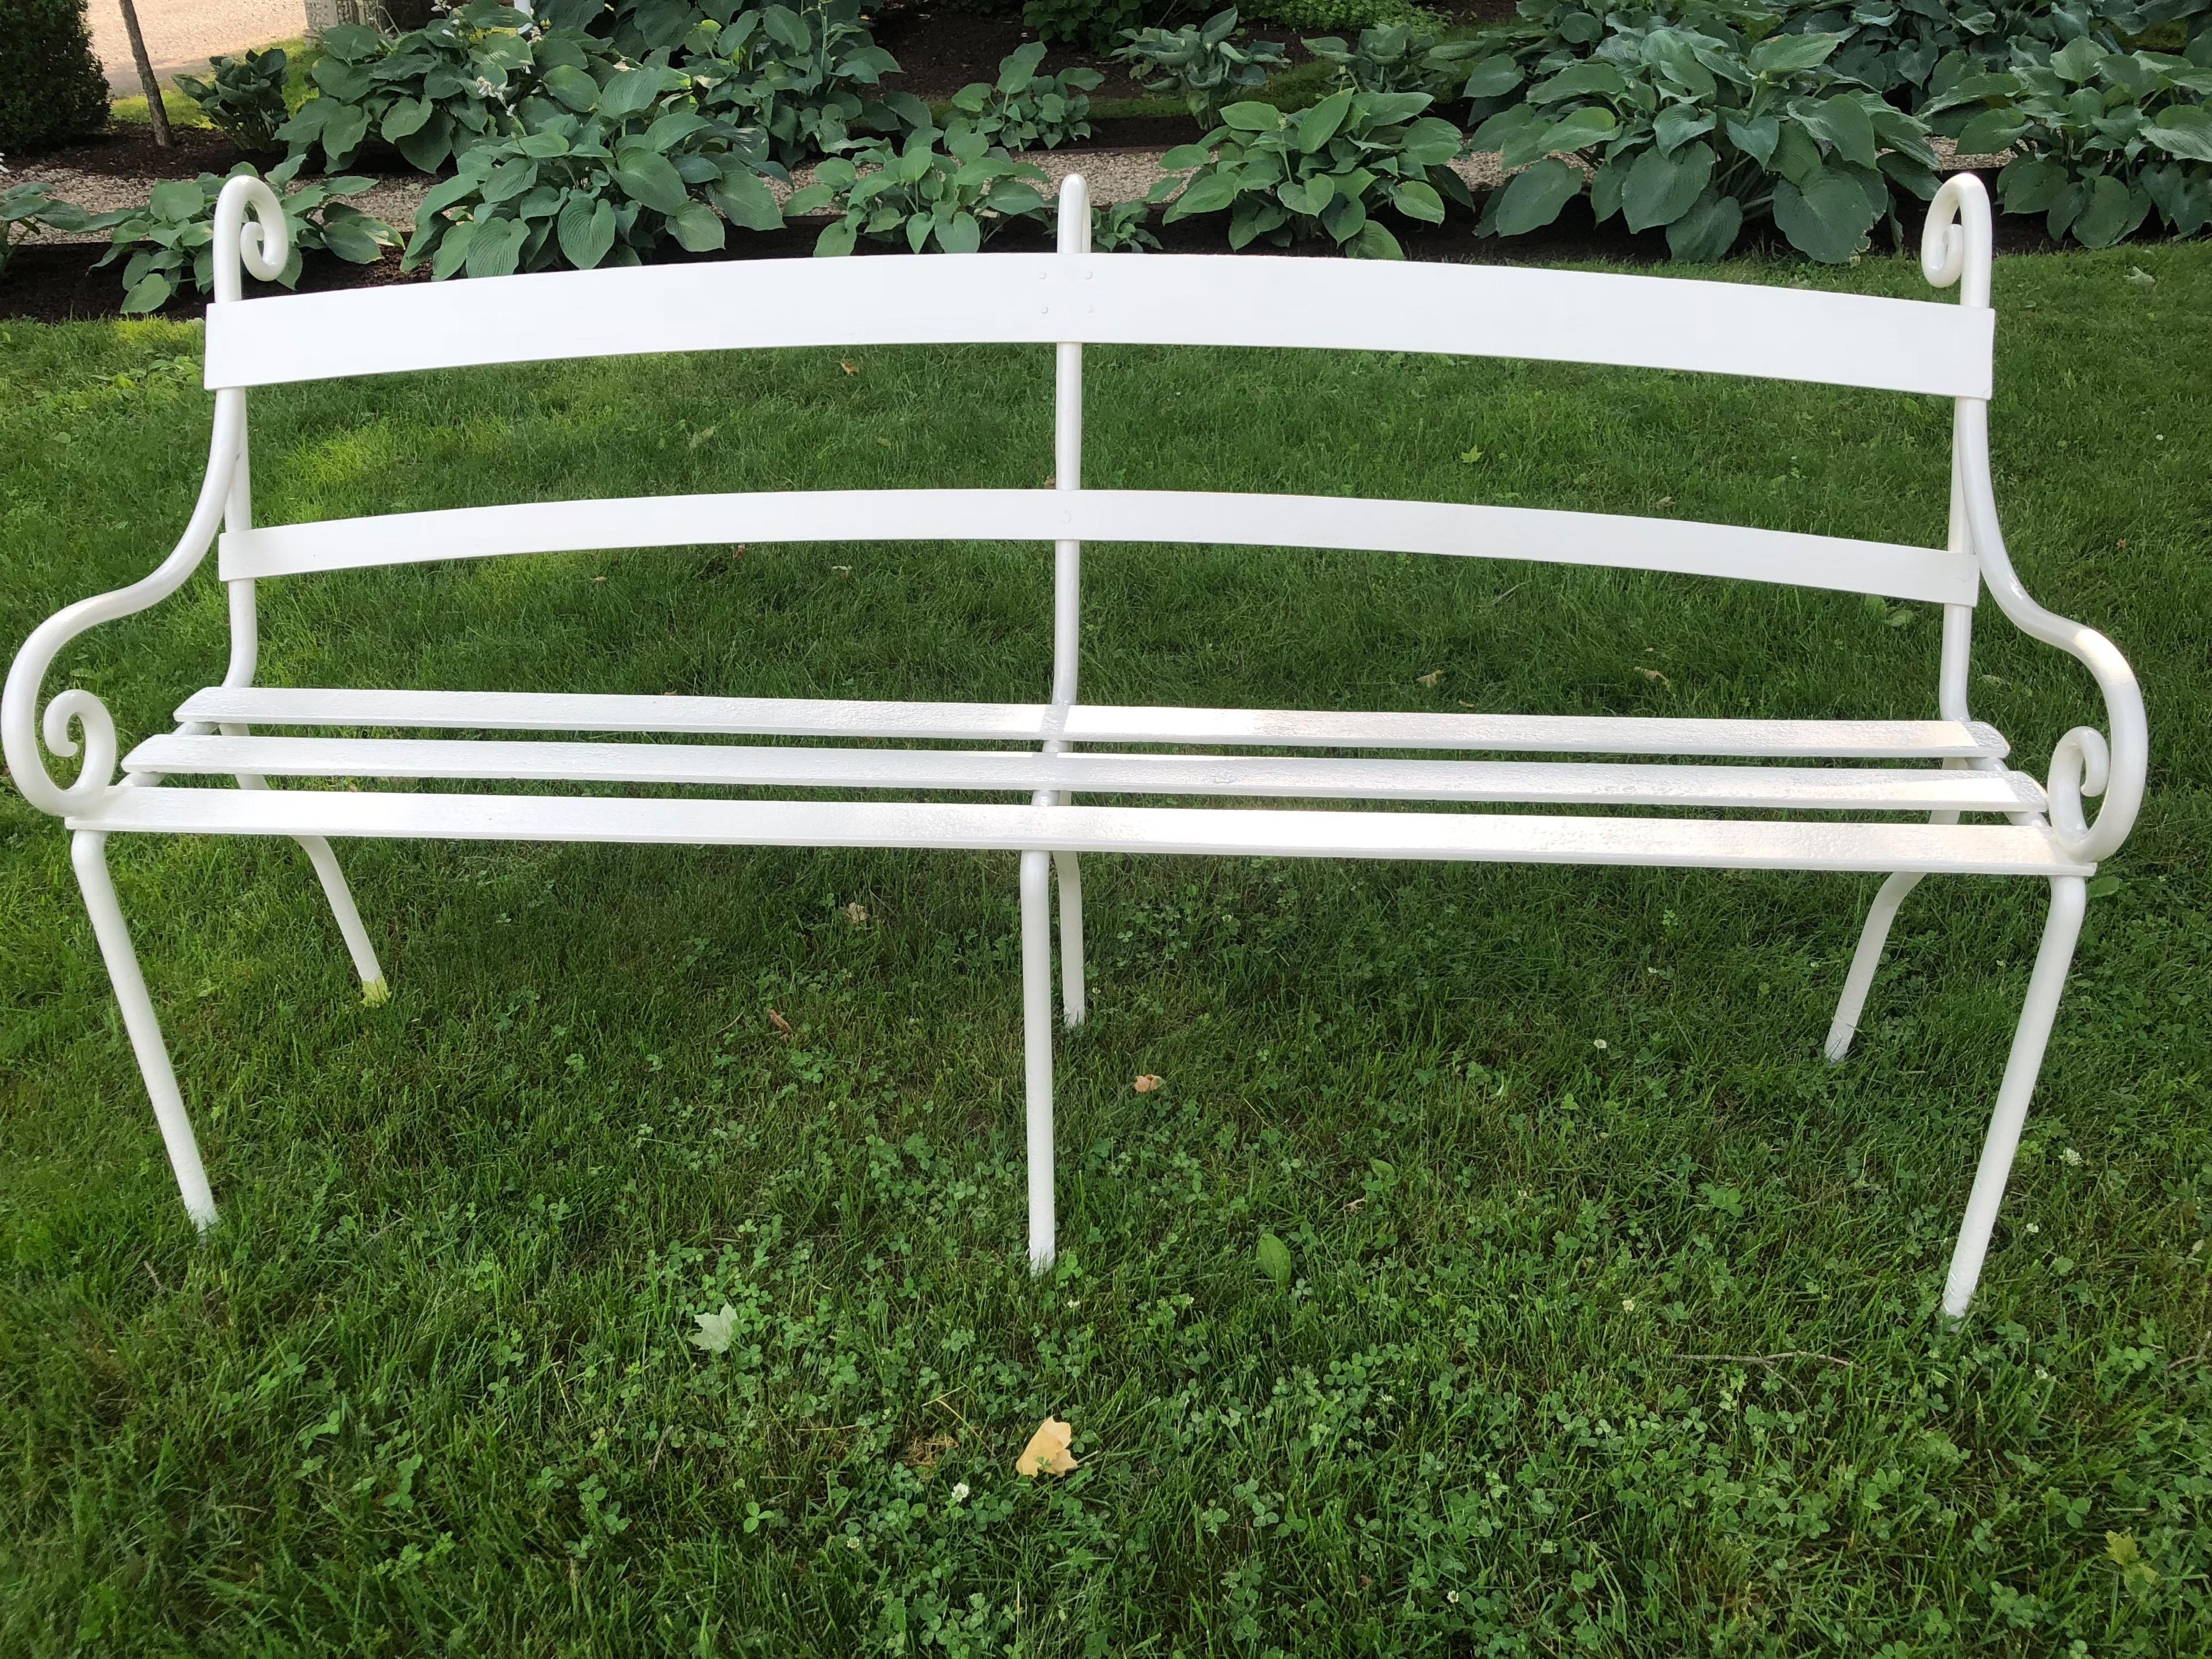 Regency Rare Scottish 19th Century Wrought Iron Garden Bench For Sale